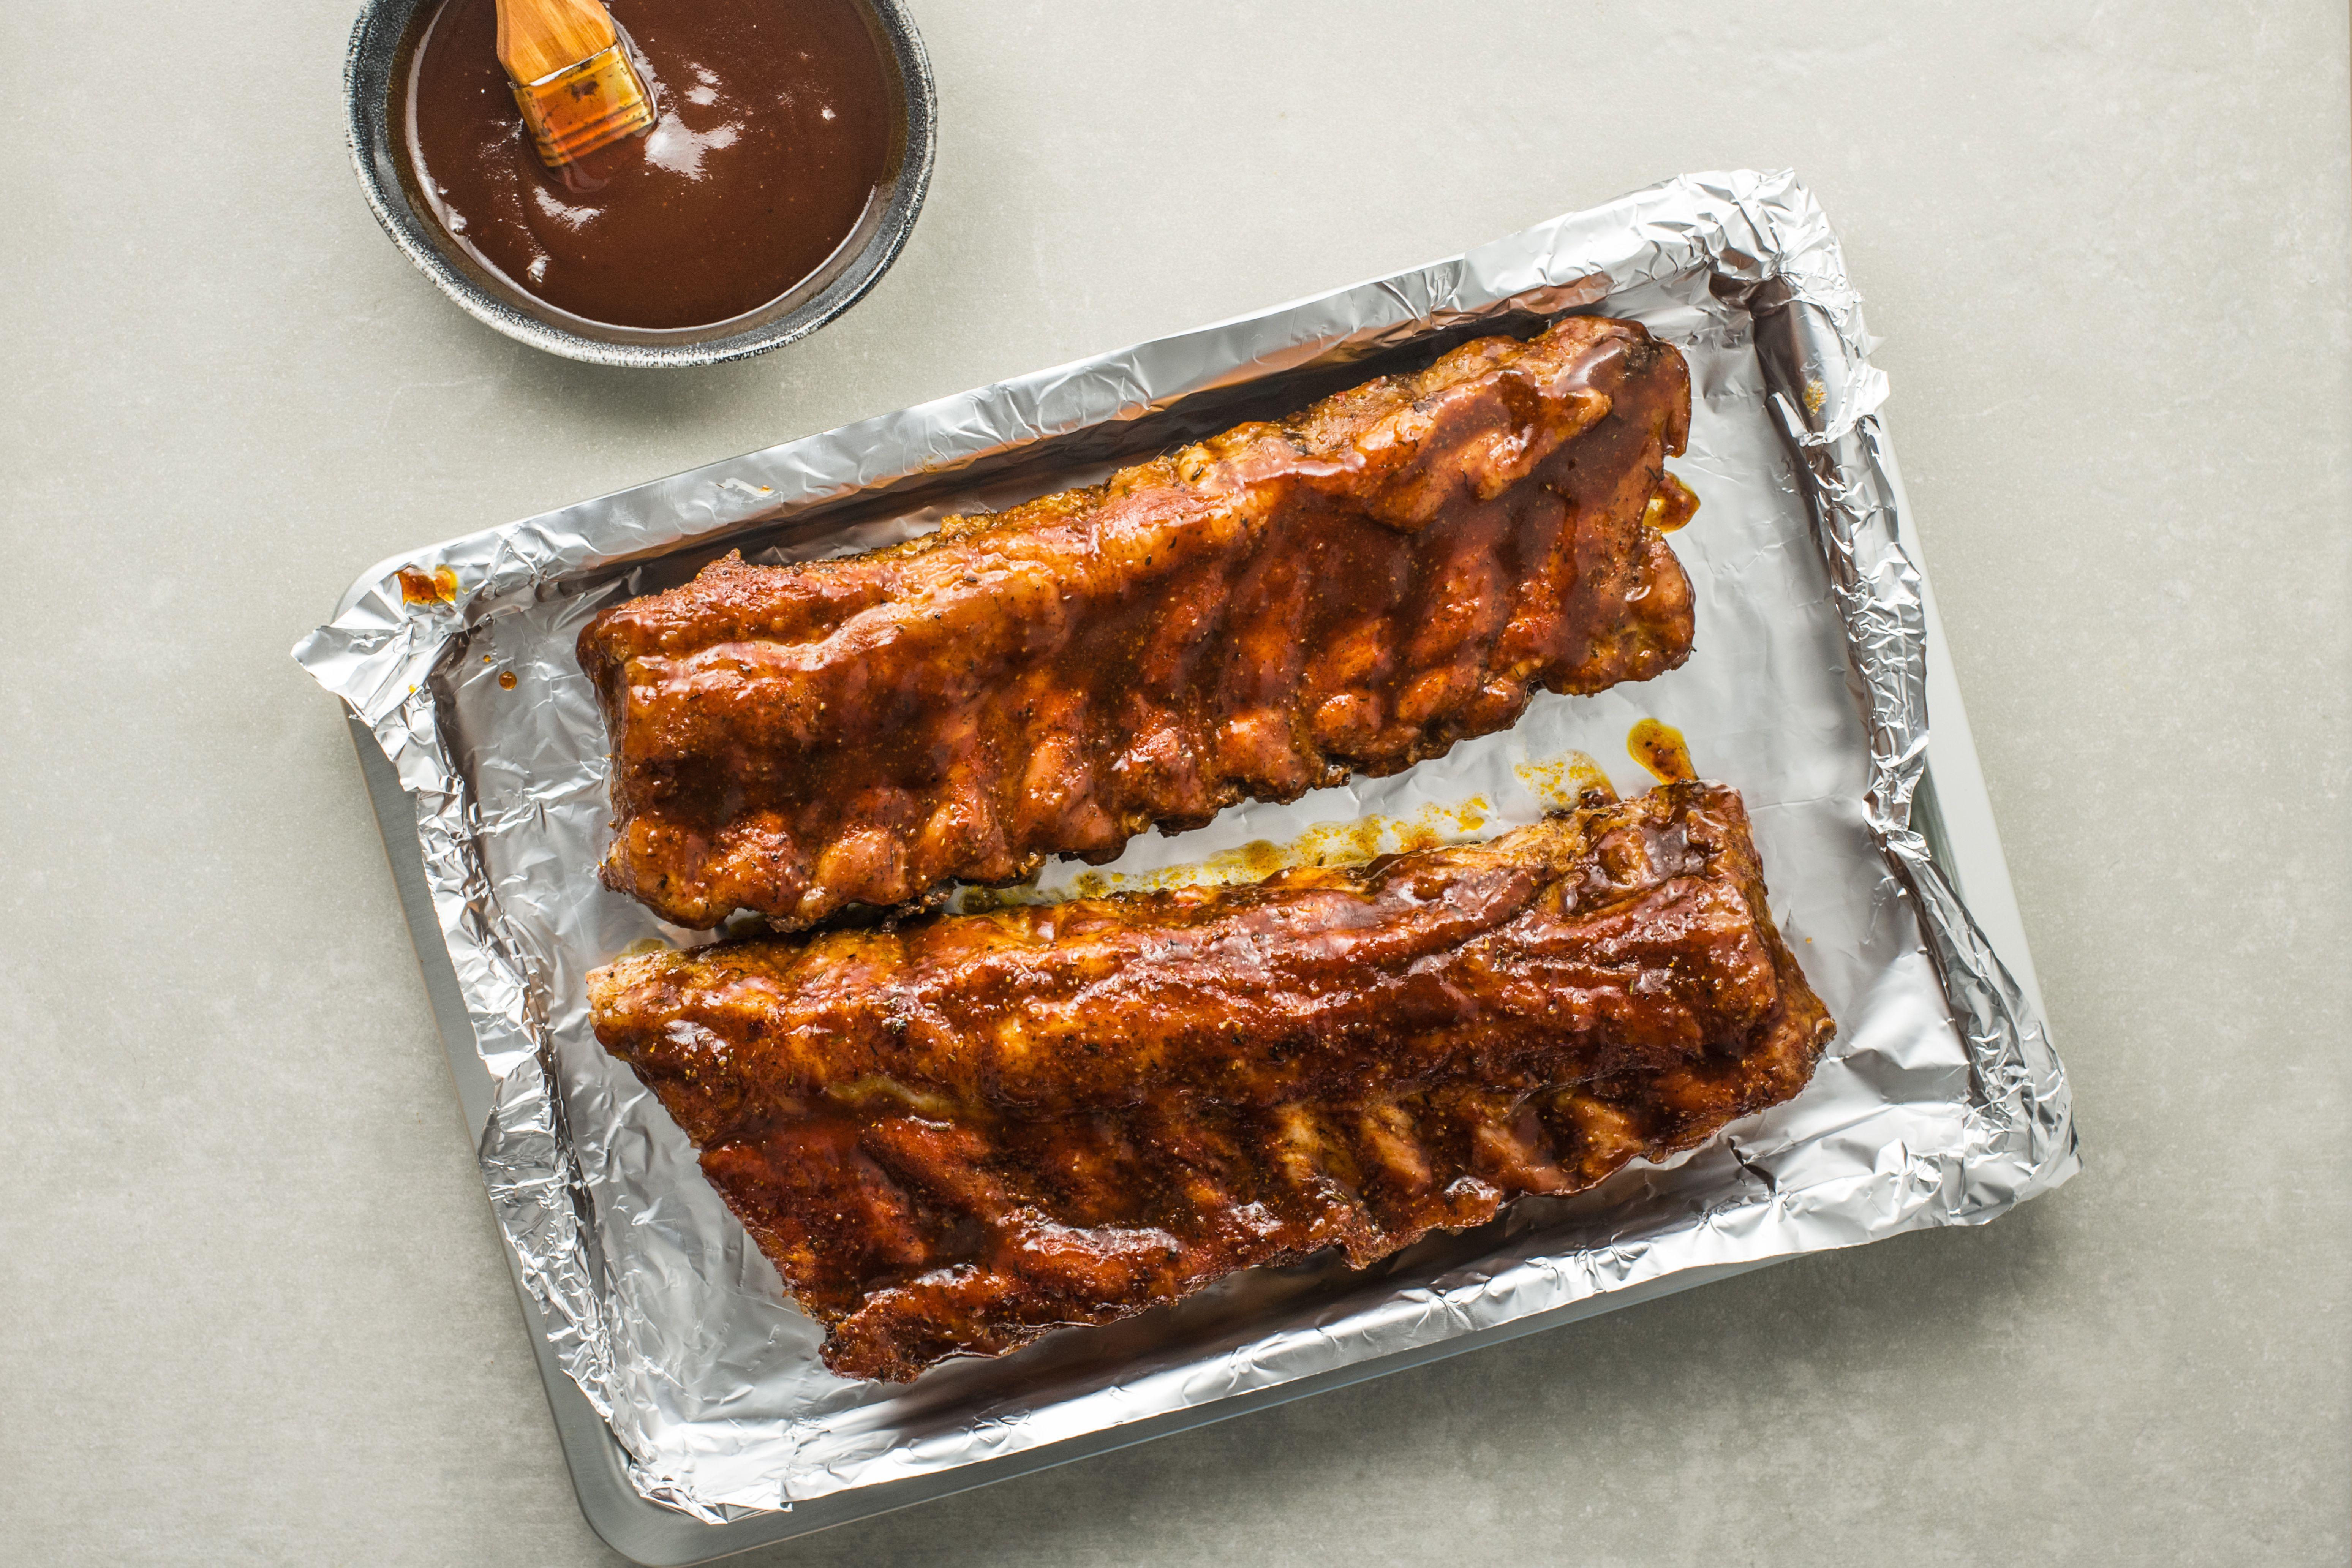 Rib racks coated in barbecue sauce